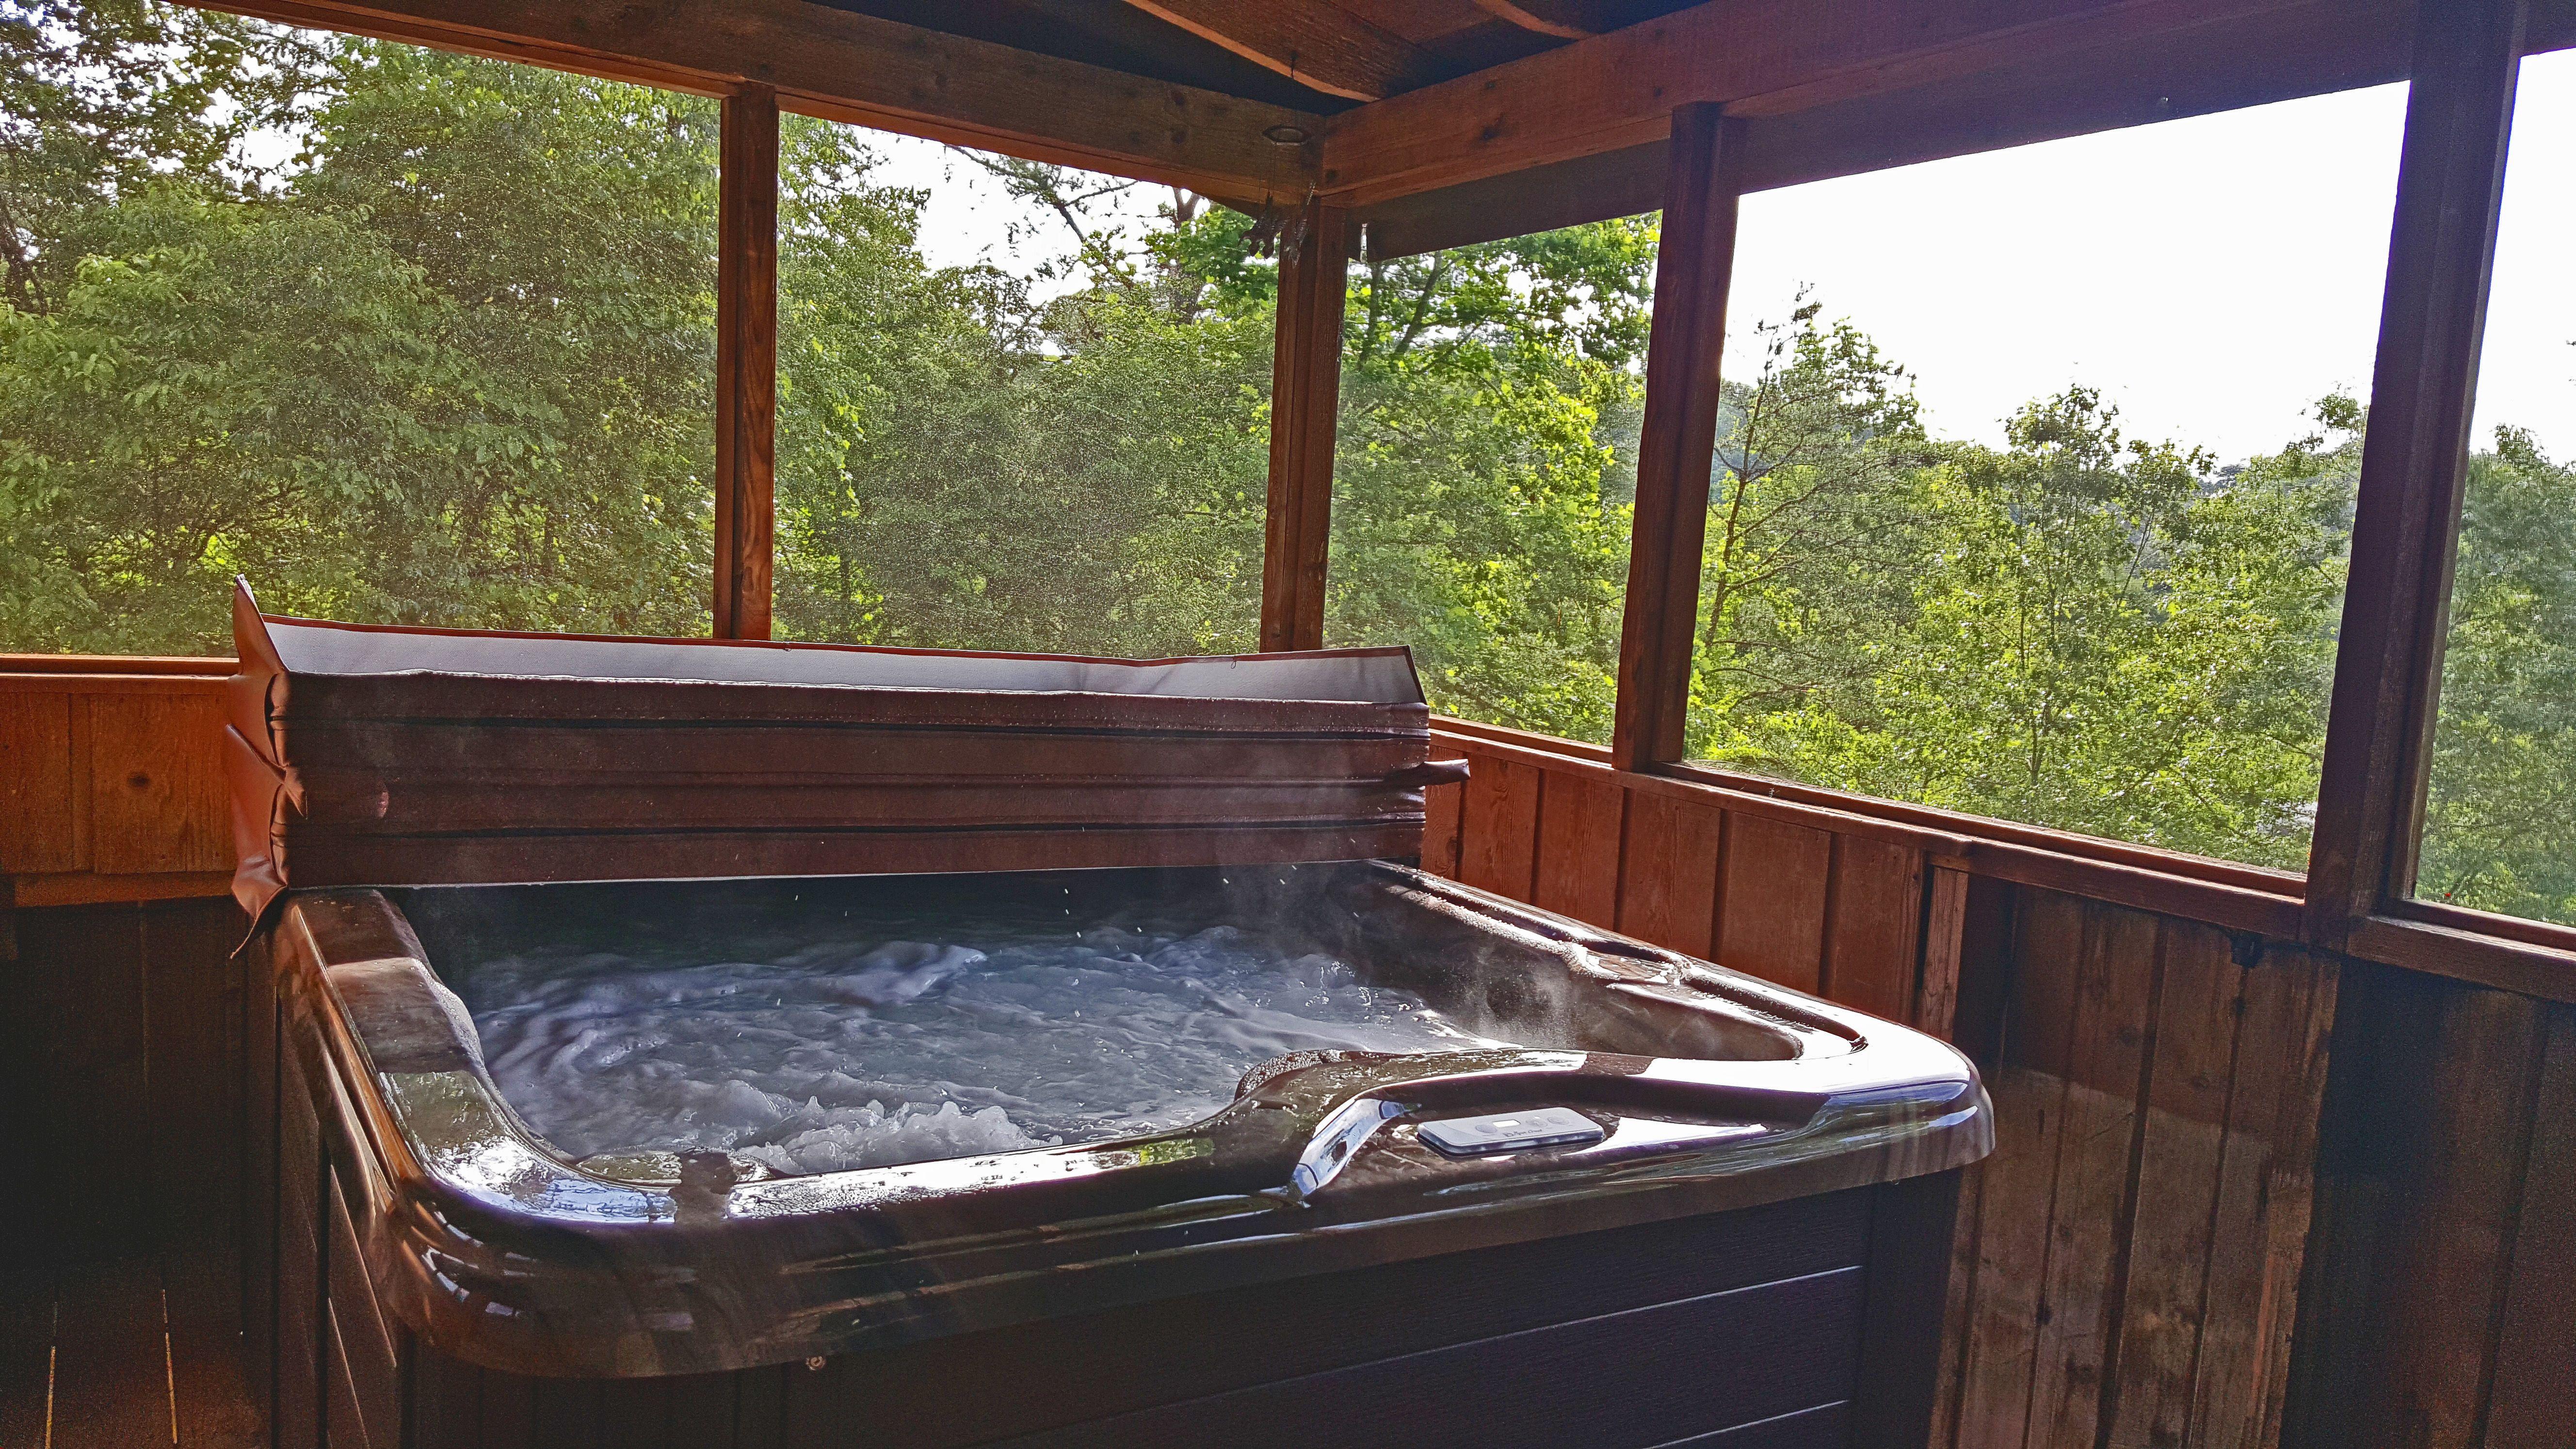 New Hot tub 2018 Rentals Cabin hot tub, Smoky mountain